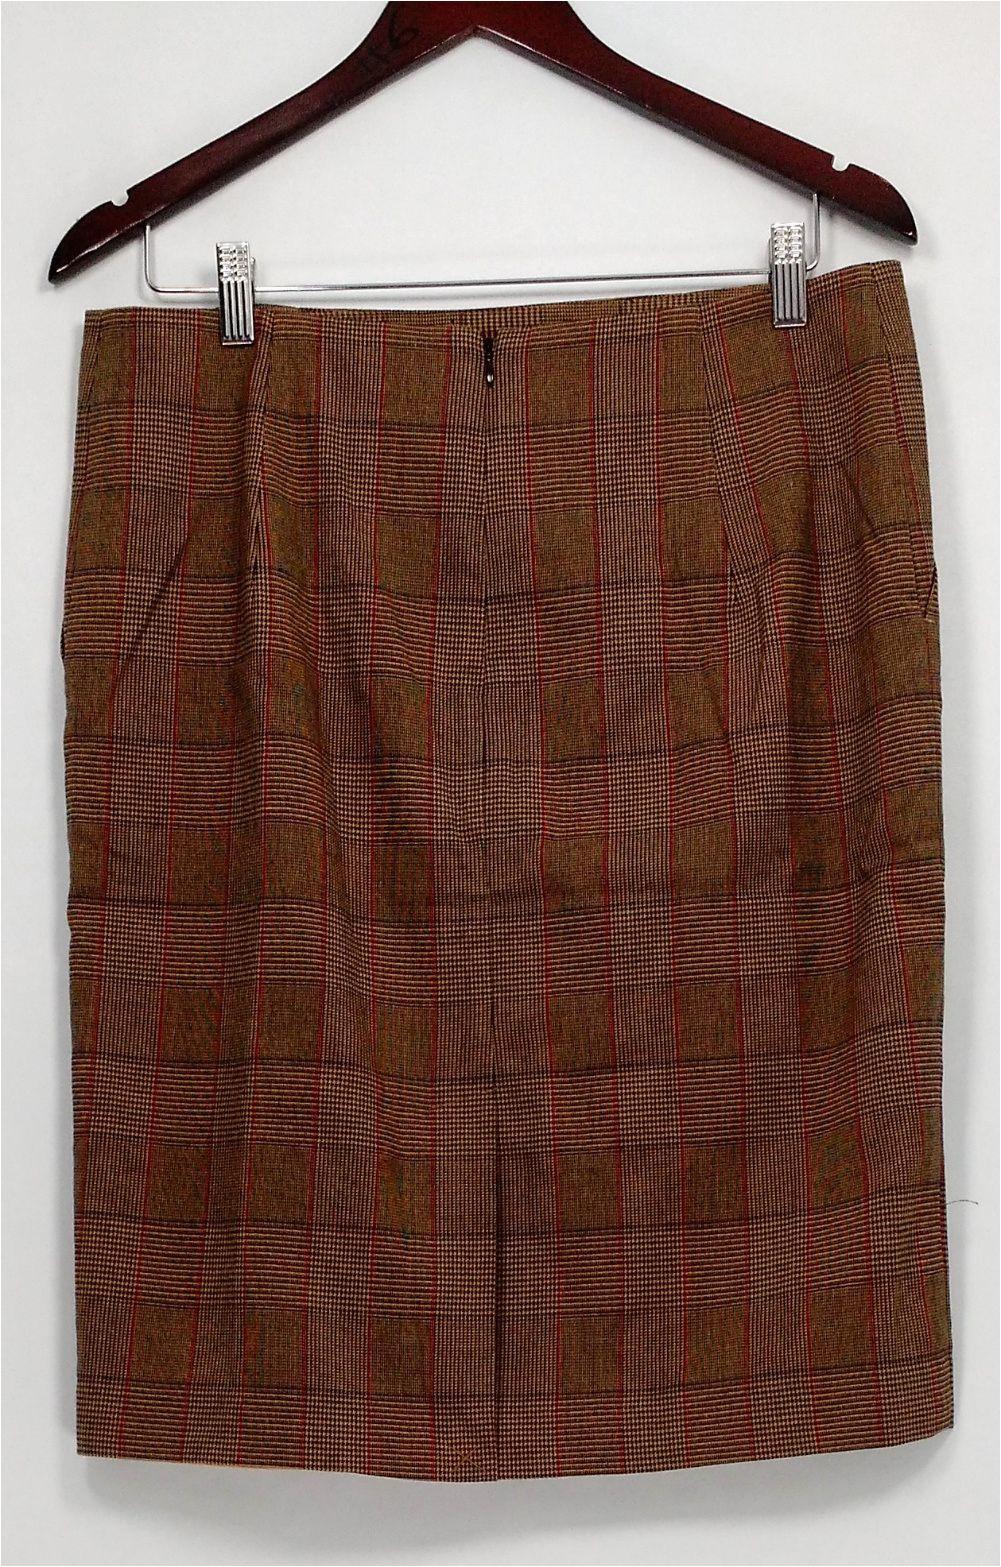 Liz Claiborne Signature Plush Bath Rug Liz Claiborne New York Skirt Sz 12 Heritage Collection Brown A